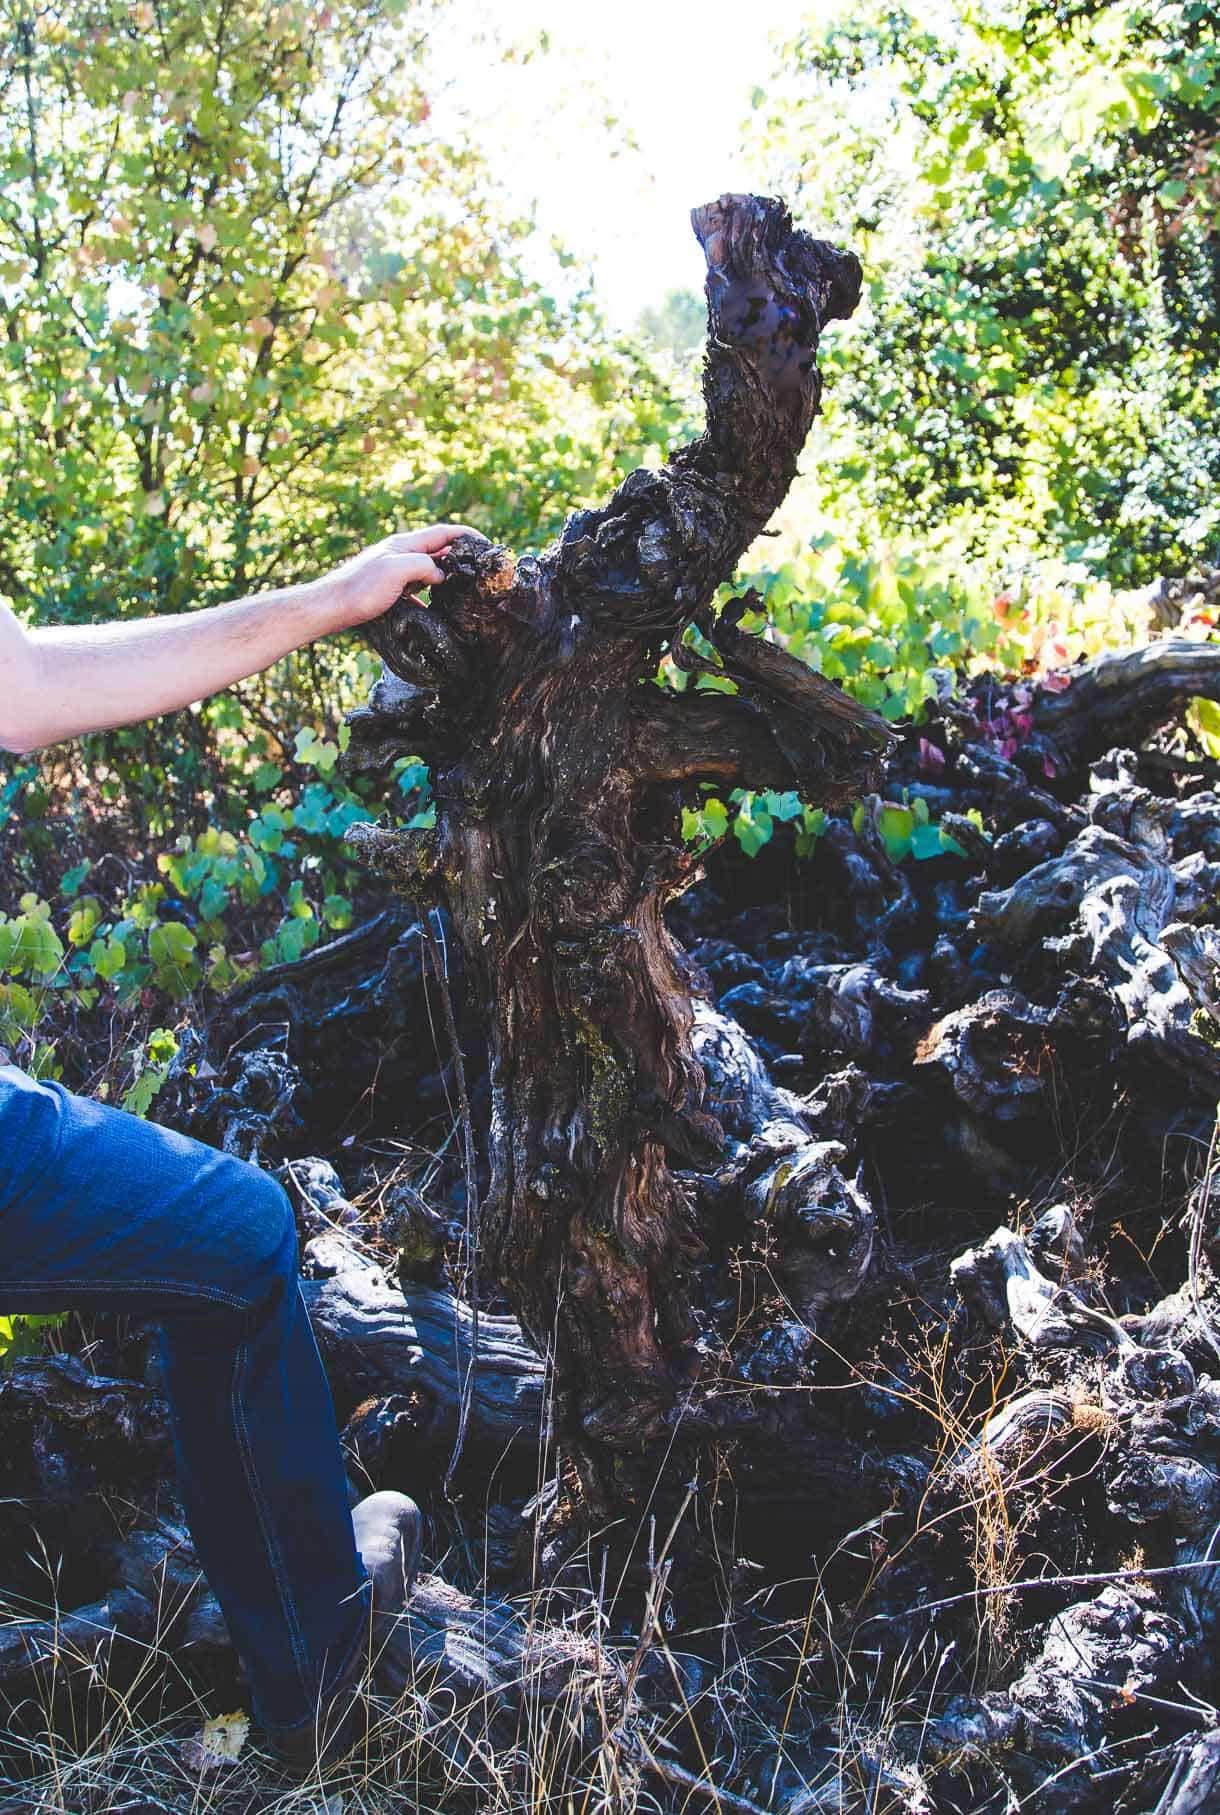 habitat preservation in LangeTwins vineyard